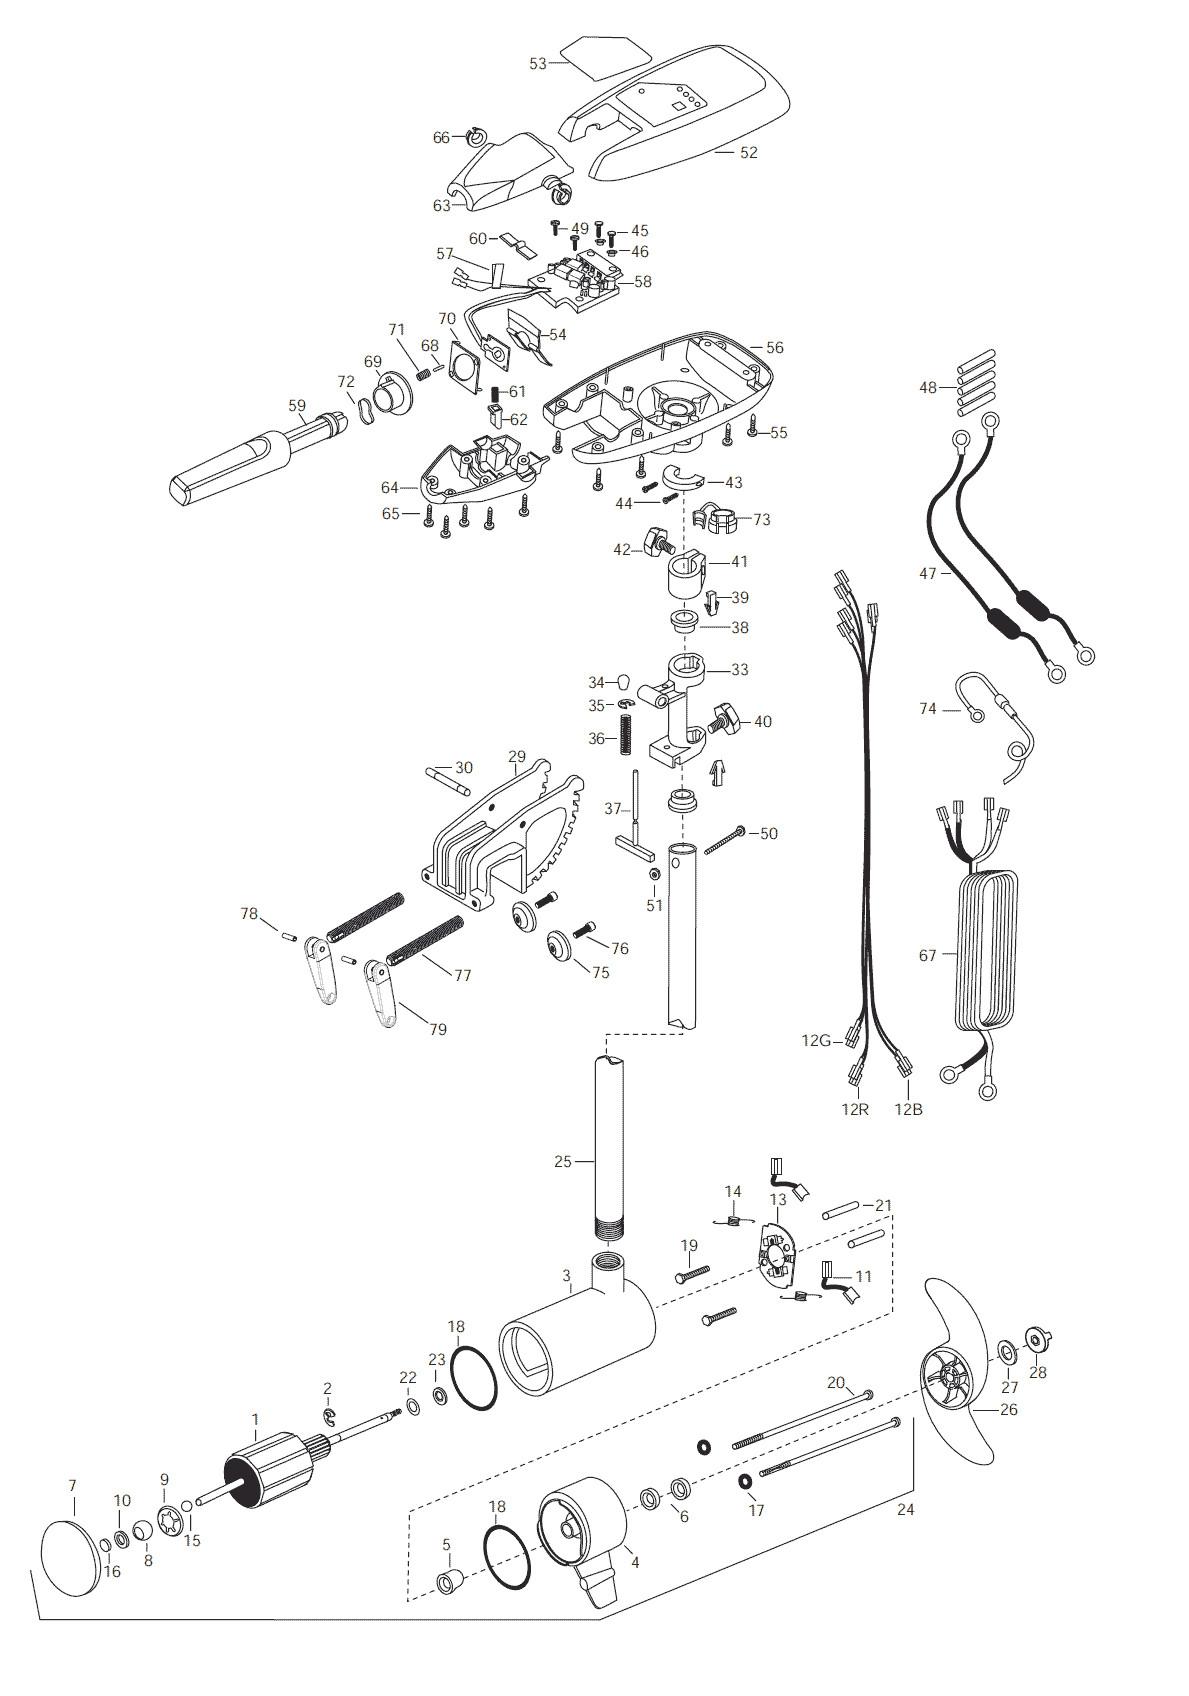 Zt Minn Kota 35 Wiring Diagram Download Diagram